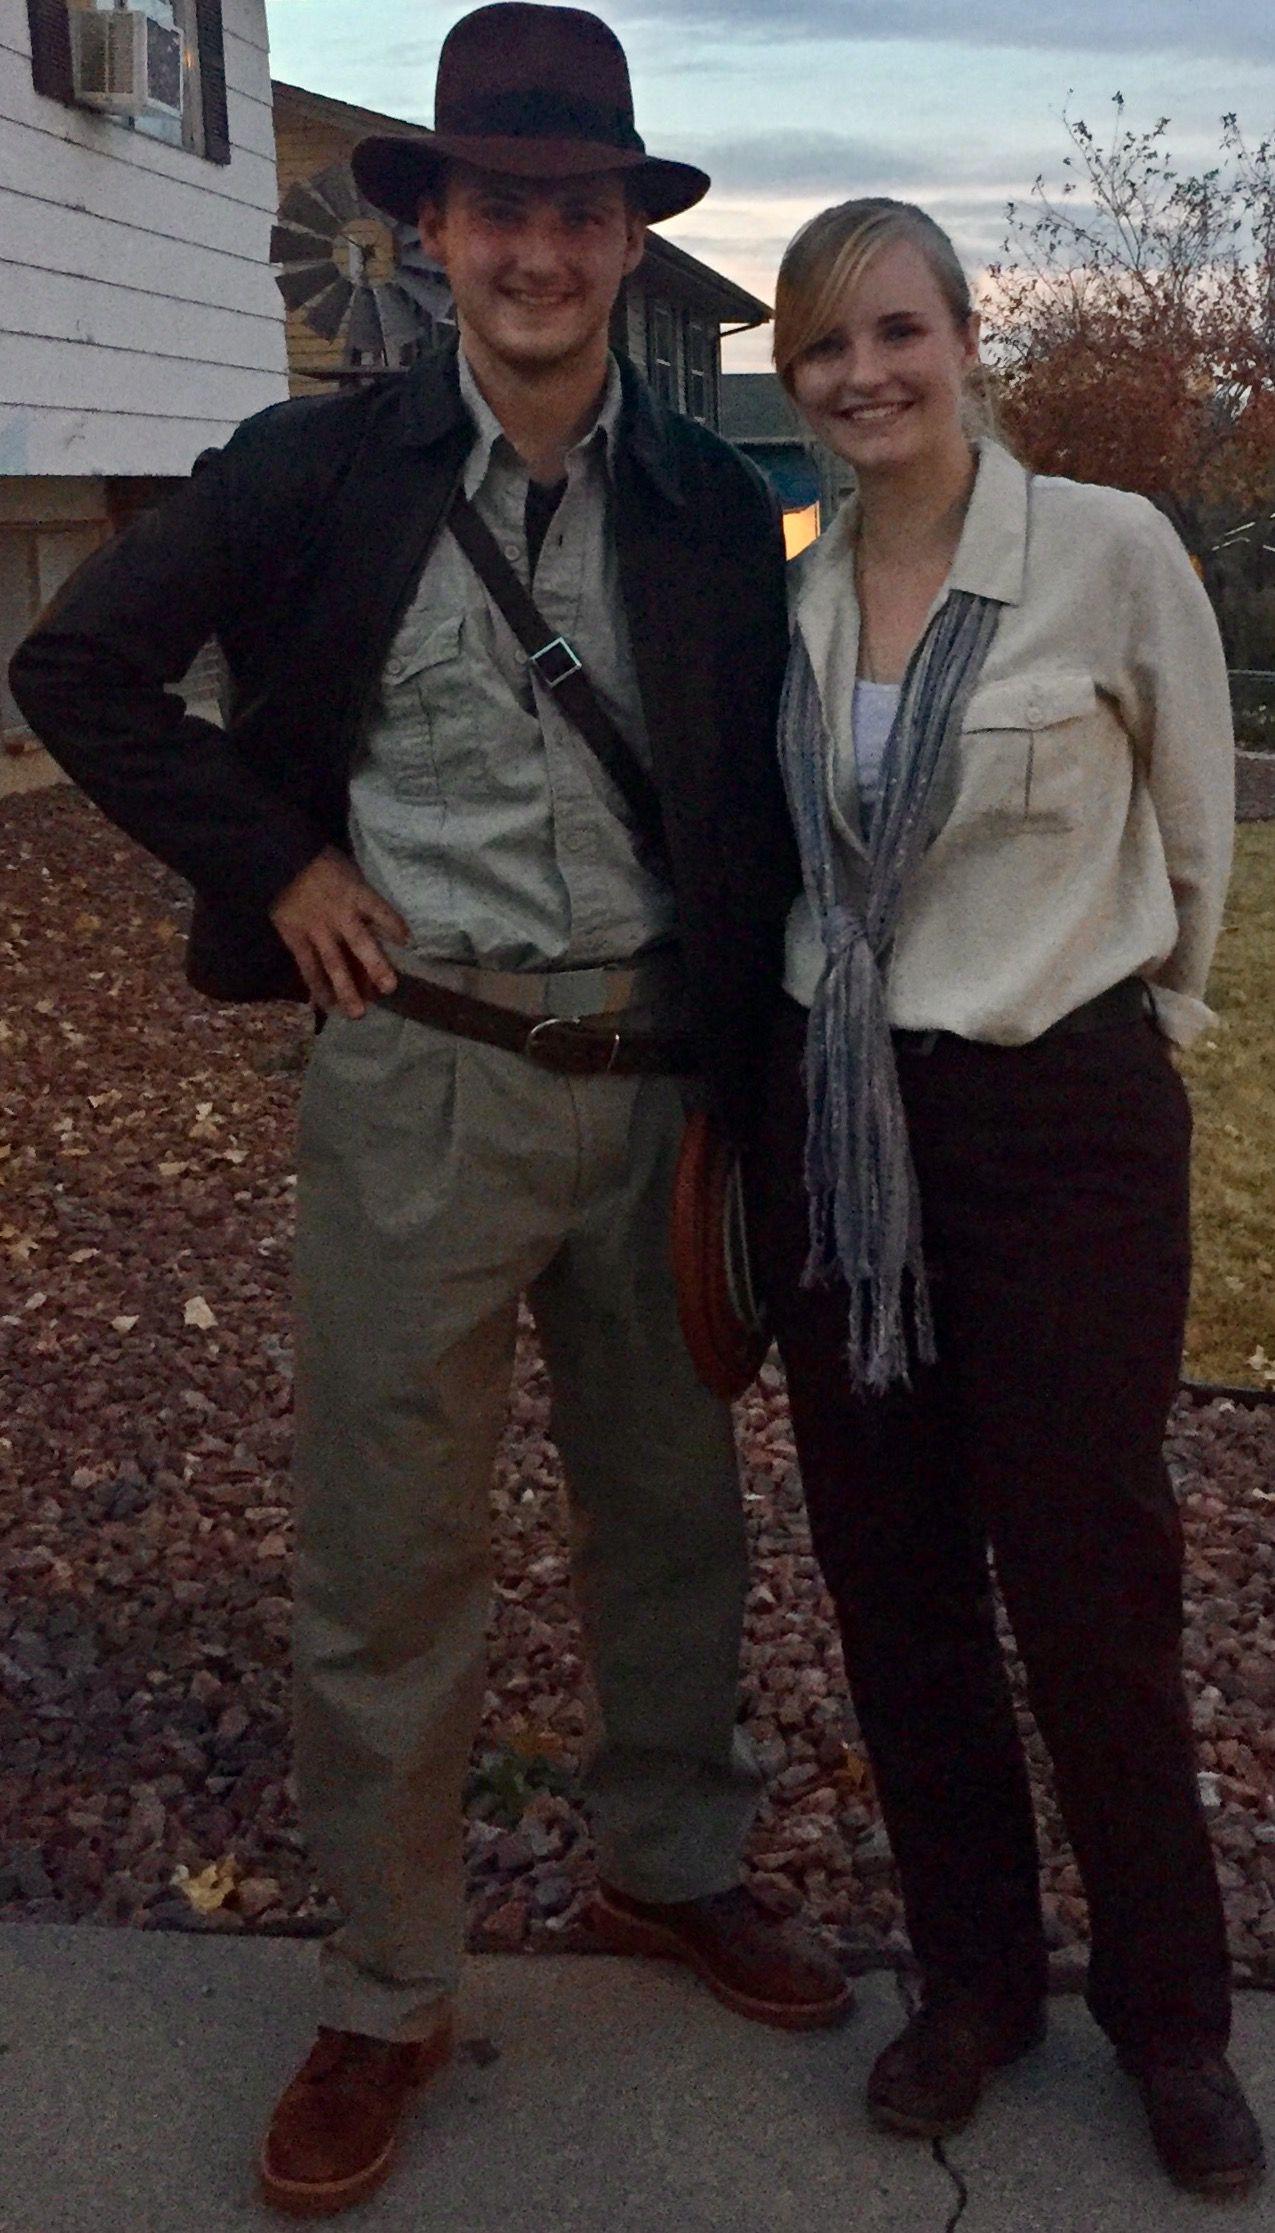 Raiders of the Lost Ark  Cosplay Jones Costume Whole Set Halloween Party